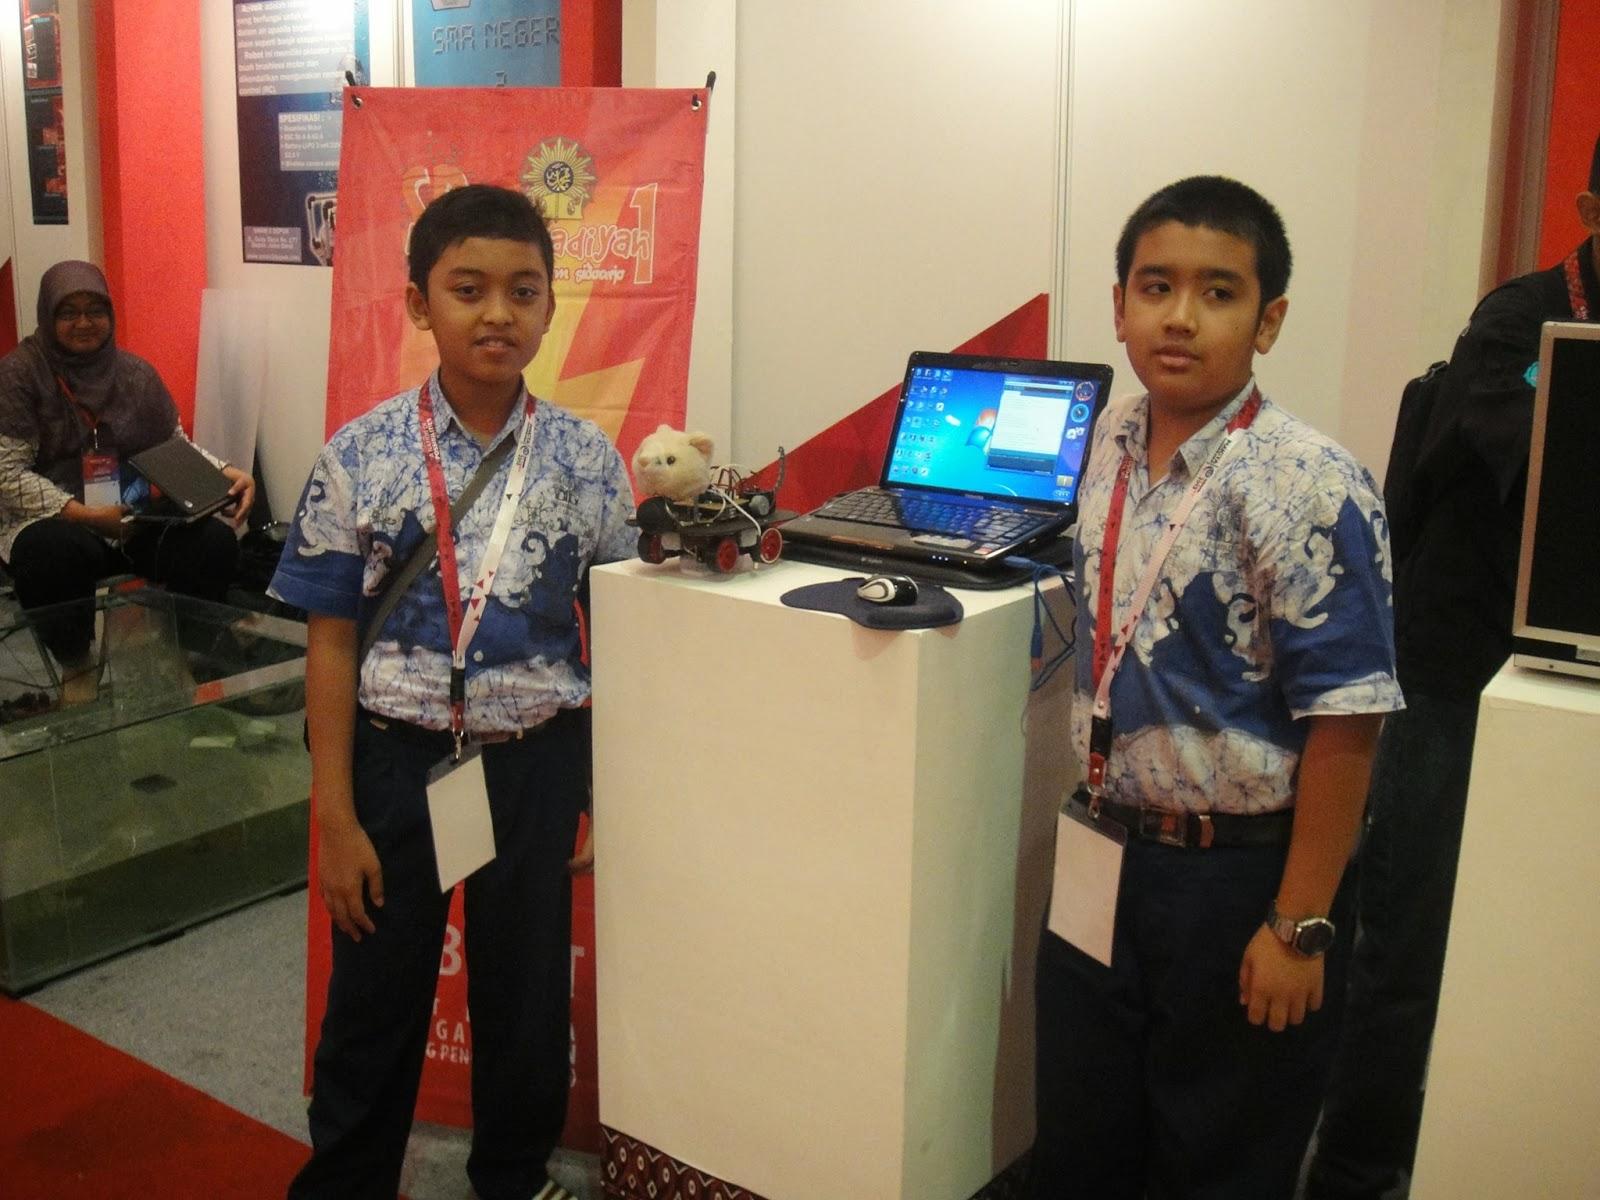 Experience Of Akise Muhida On Indonesia ICT Award 2013 Dengan Robocat